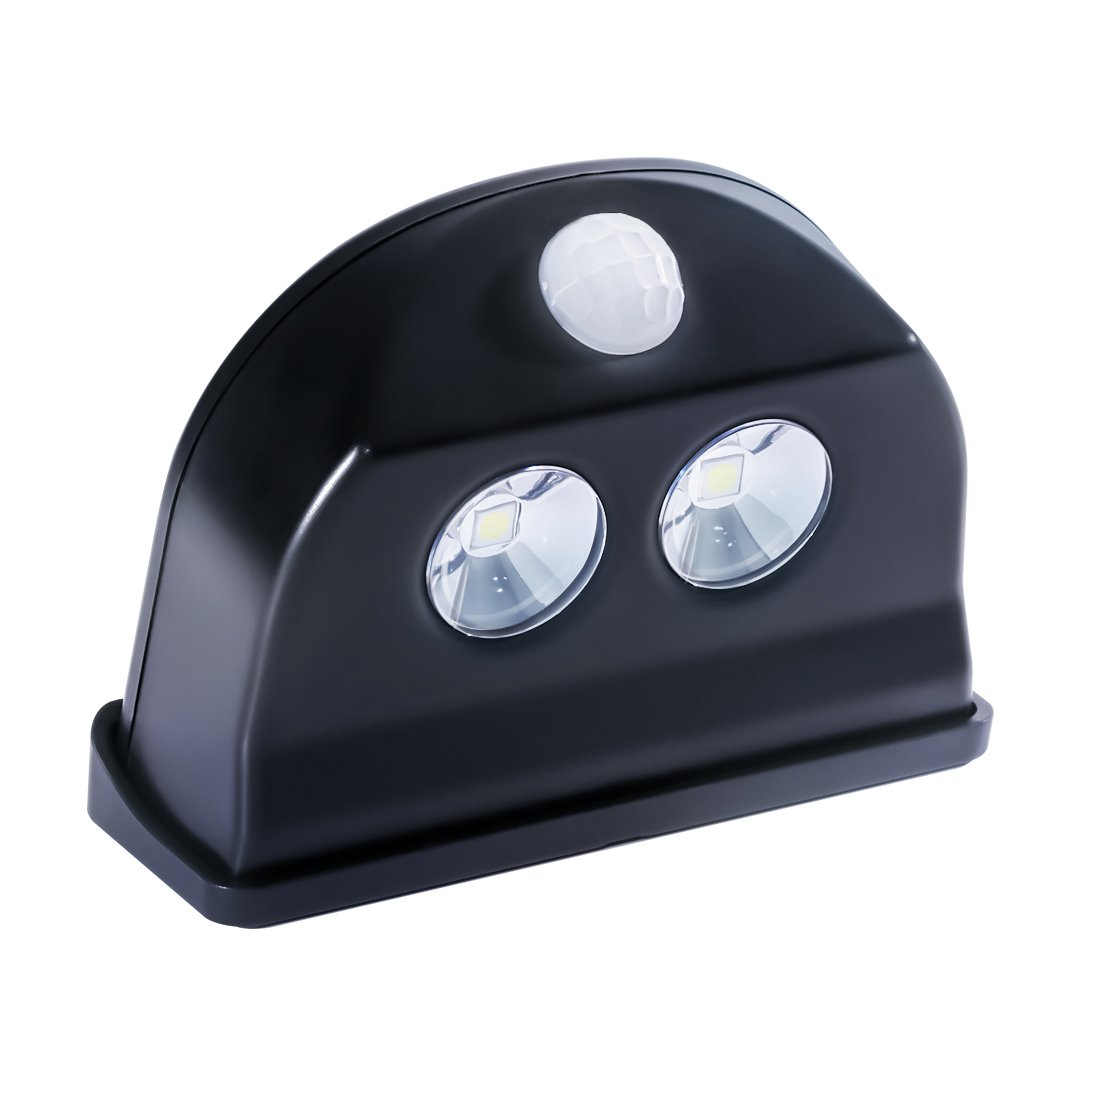 Motion Sensor Light Outdoor Battery Powered - Waterproof - Lasting Power - LED Step Light, Stair Light, Night Light - KMSdeco Cordless Door Alarm Light - Black Color